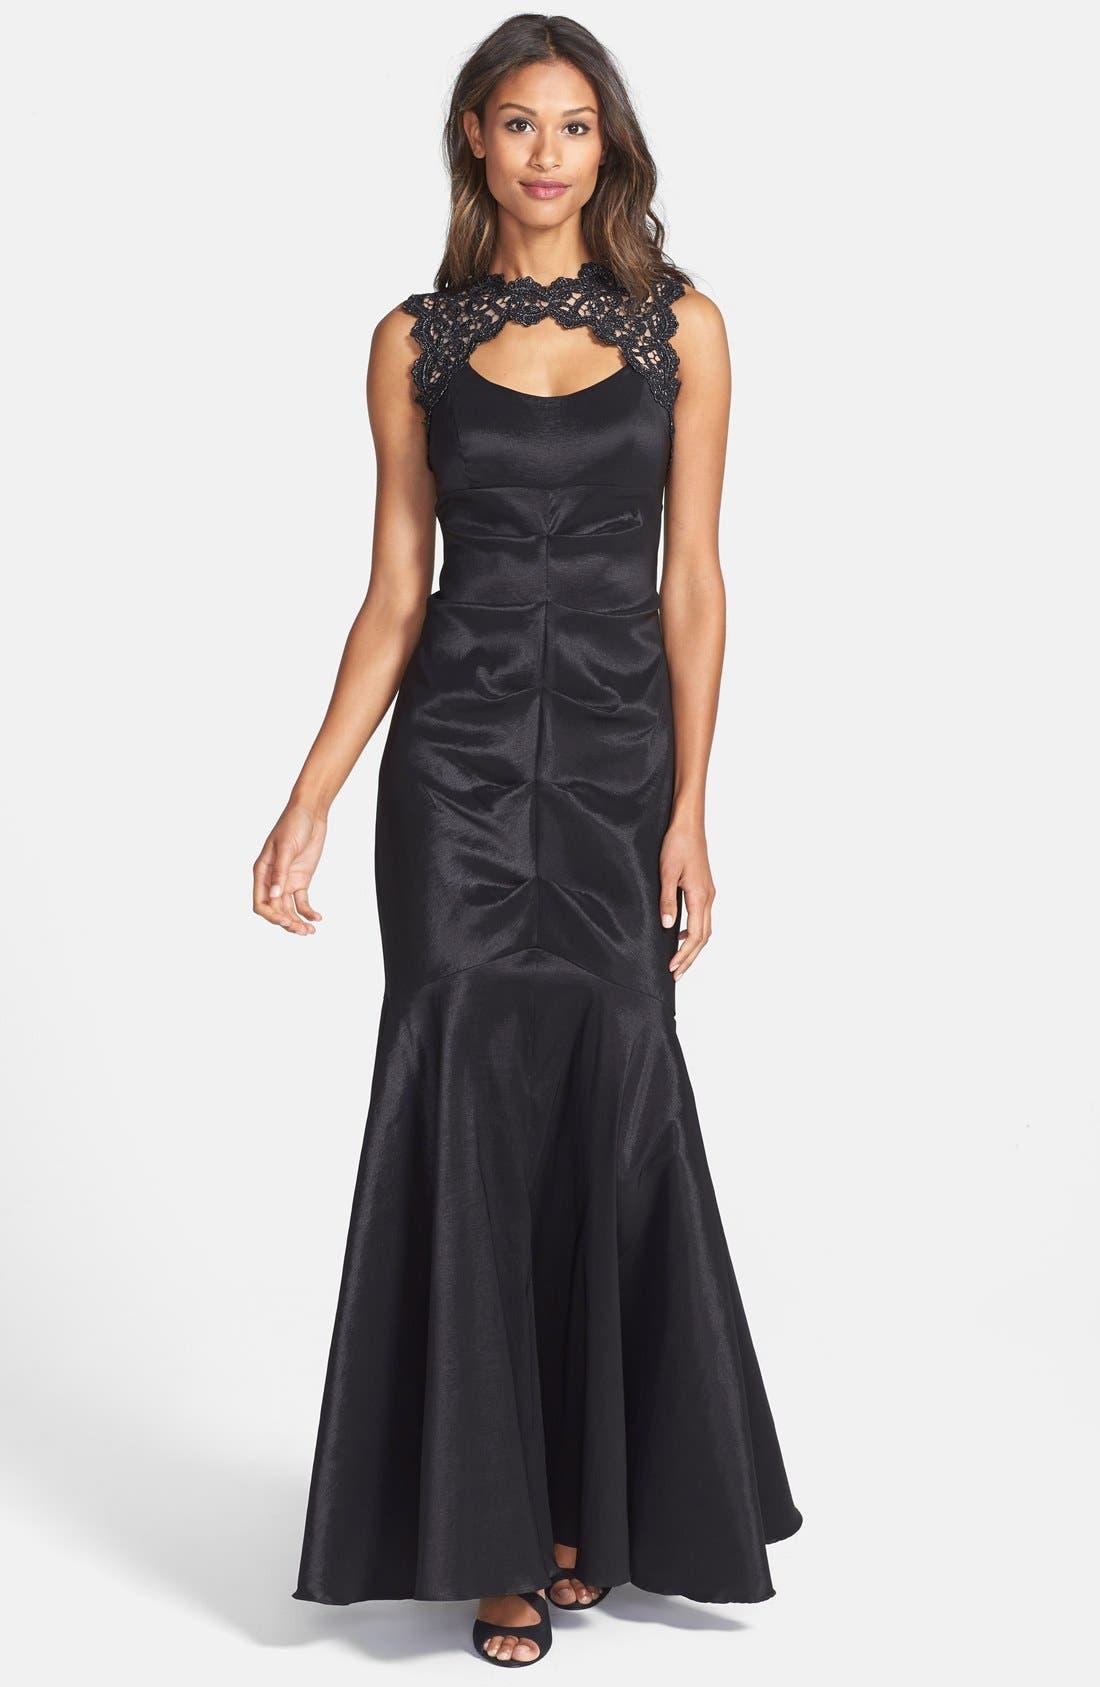 Alternate Image 1 Selected - Xscape Lace & Taffeta Mermaid Gown (Regular & Petite)